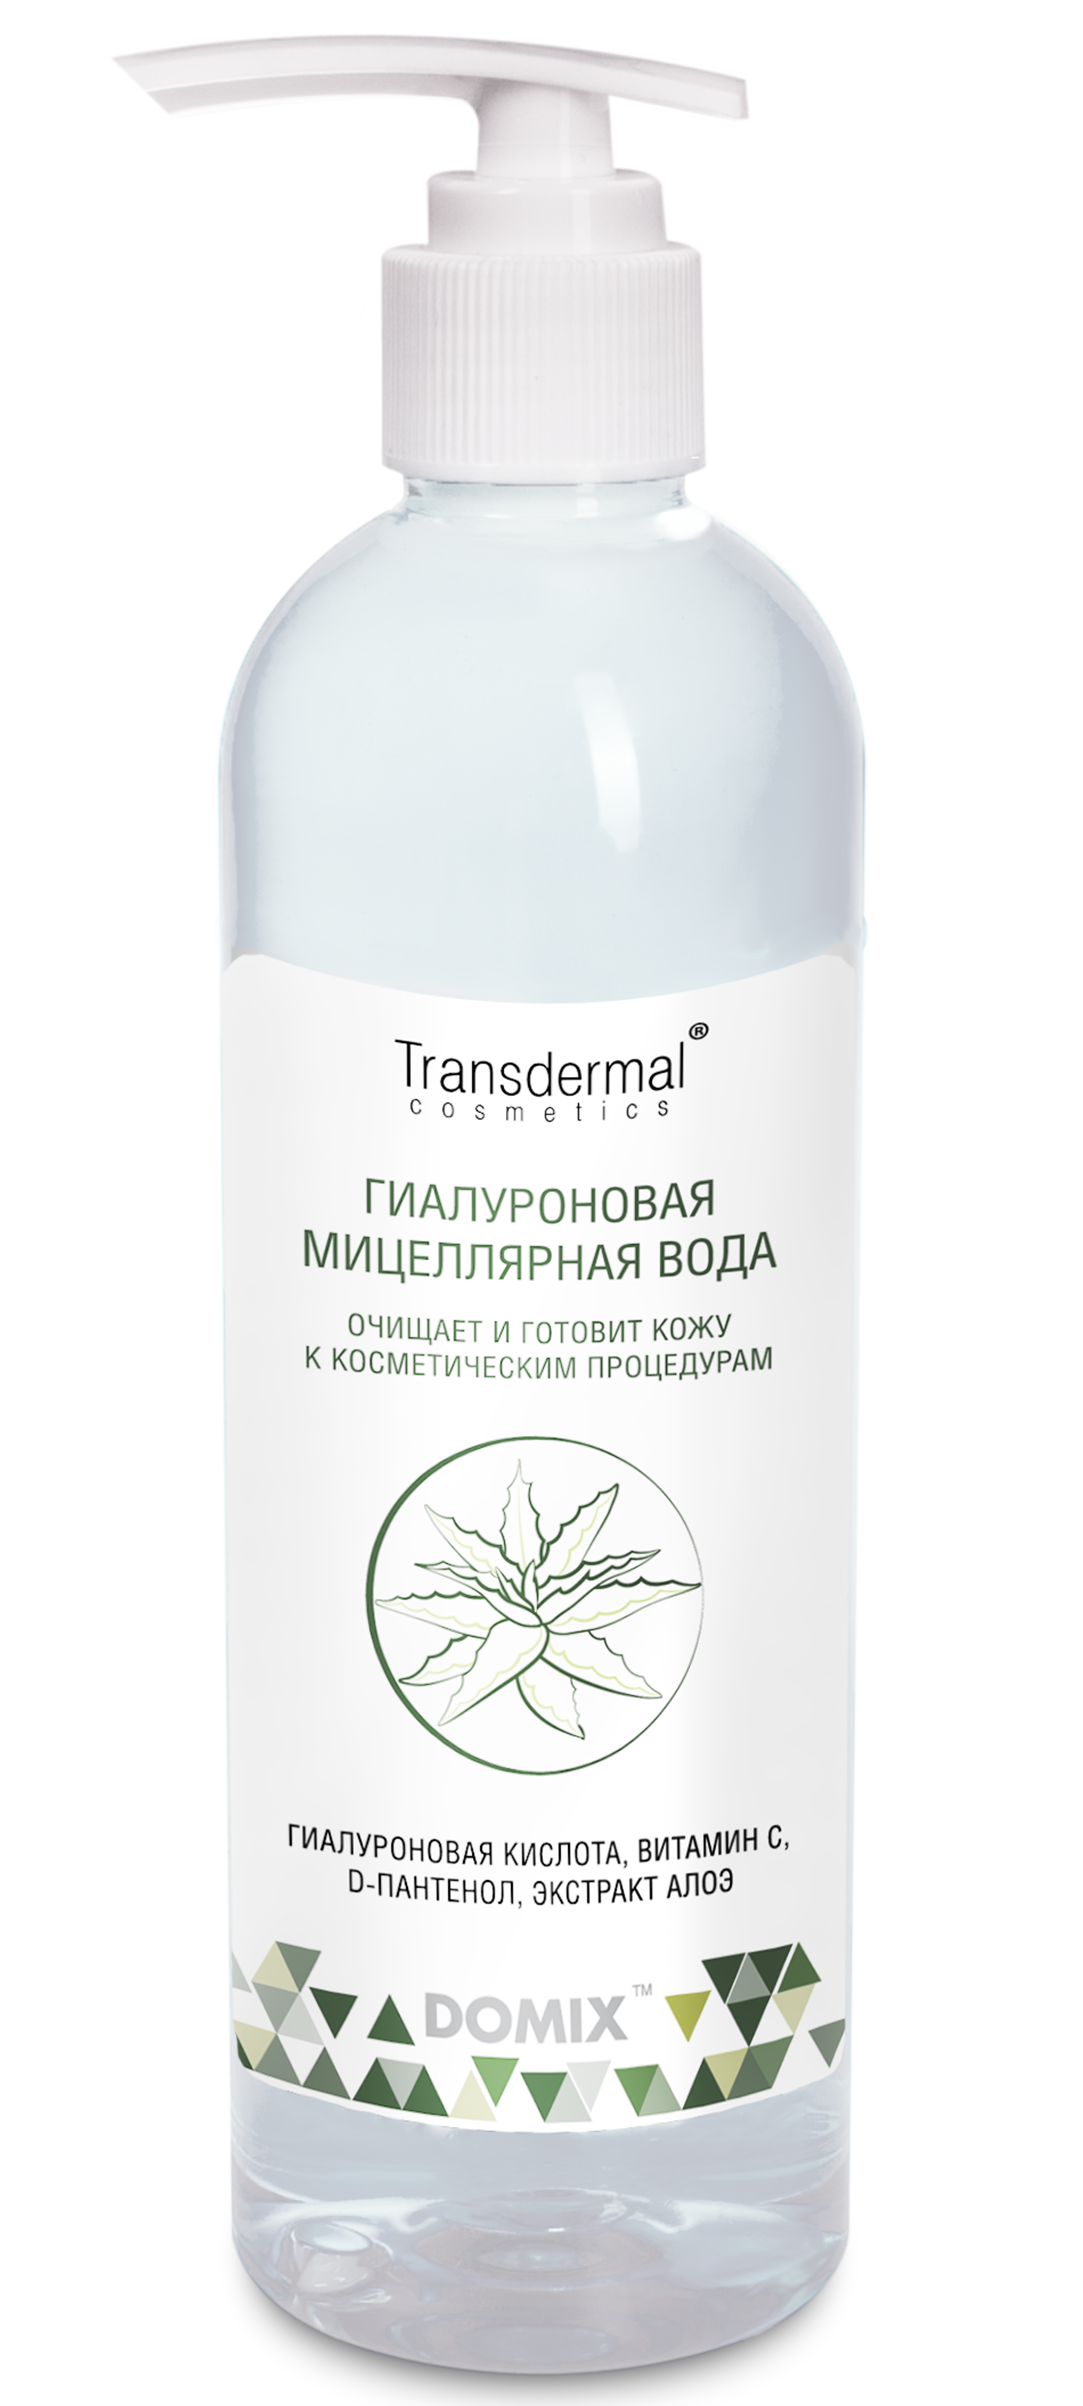 DOMIX GREEN PROFESSIONAL Вода мицеллярная гиалуроновая / Transdermal Cosmetics 250 мл фото